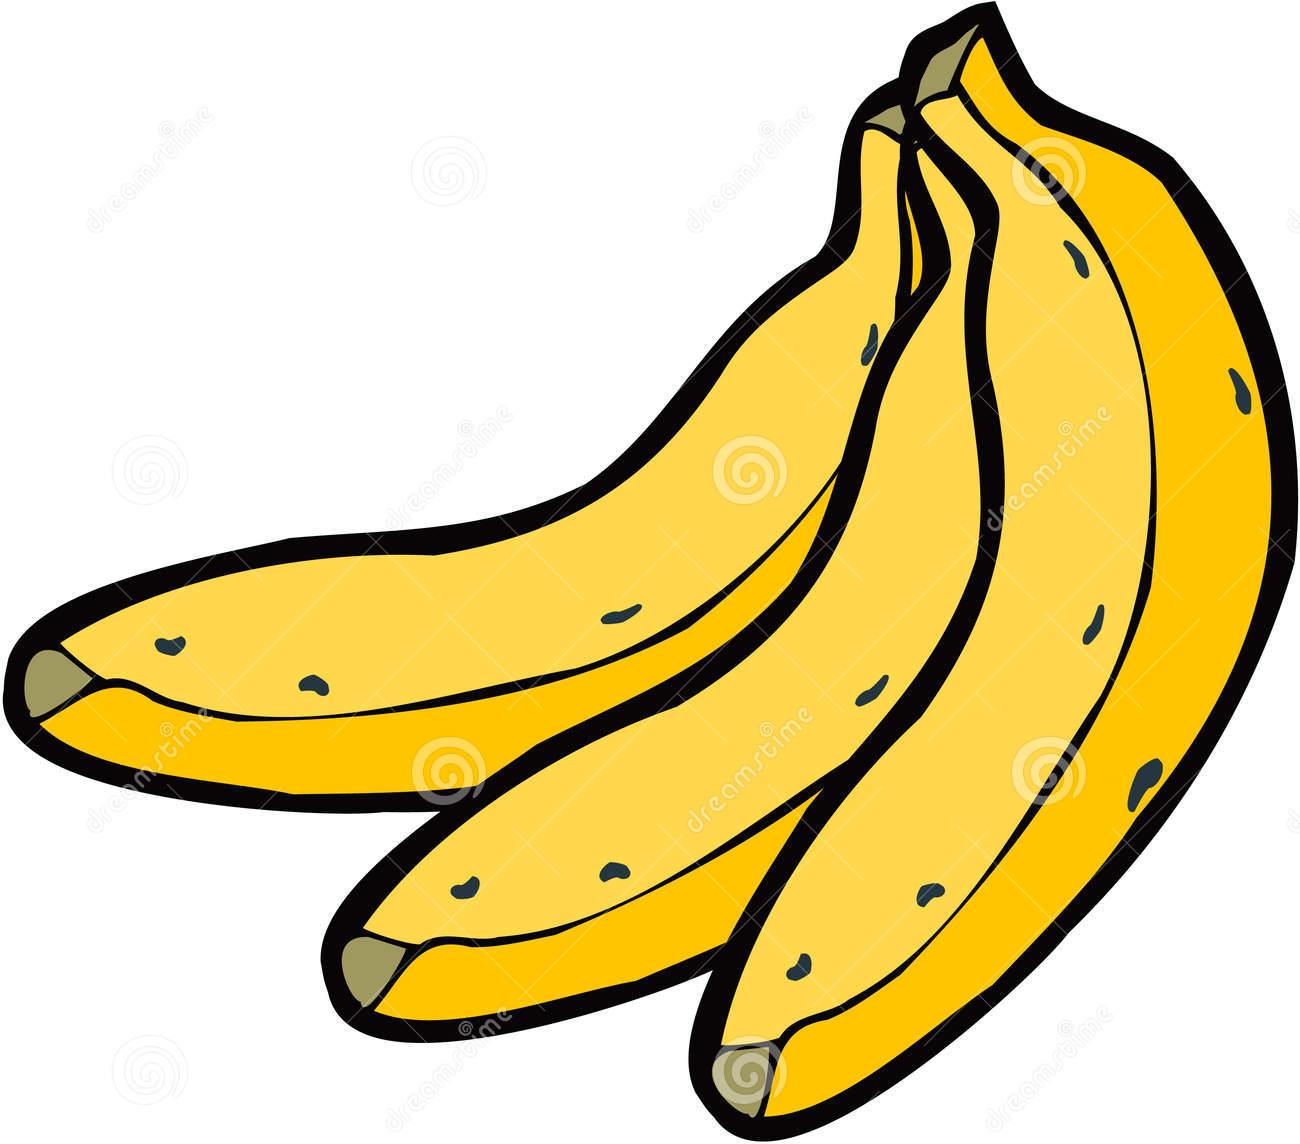 Banana clipart 4